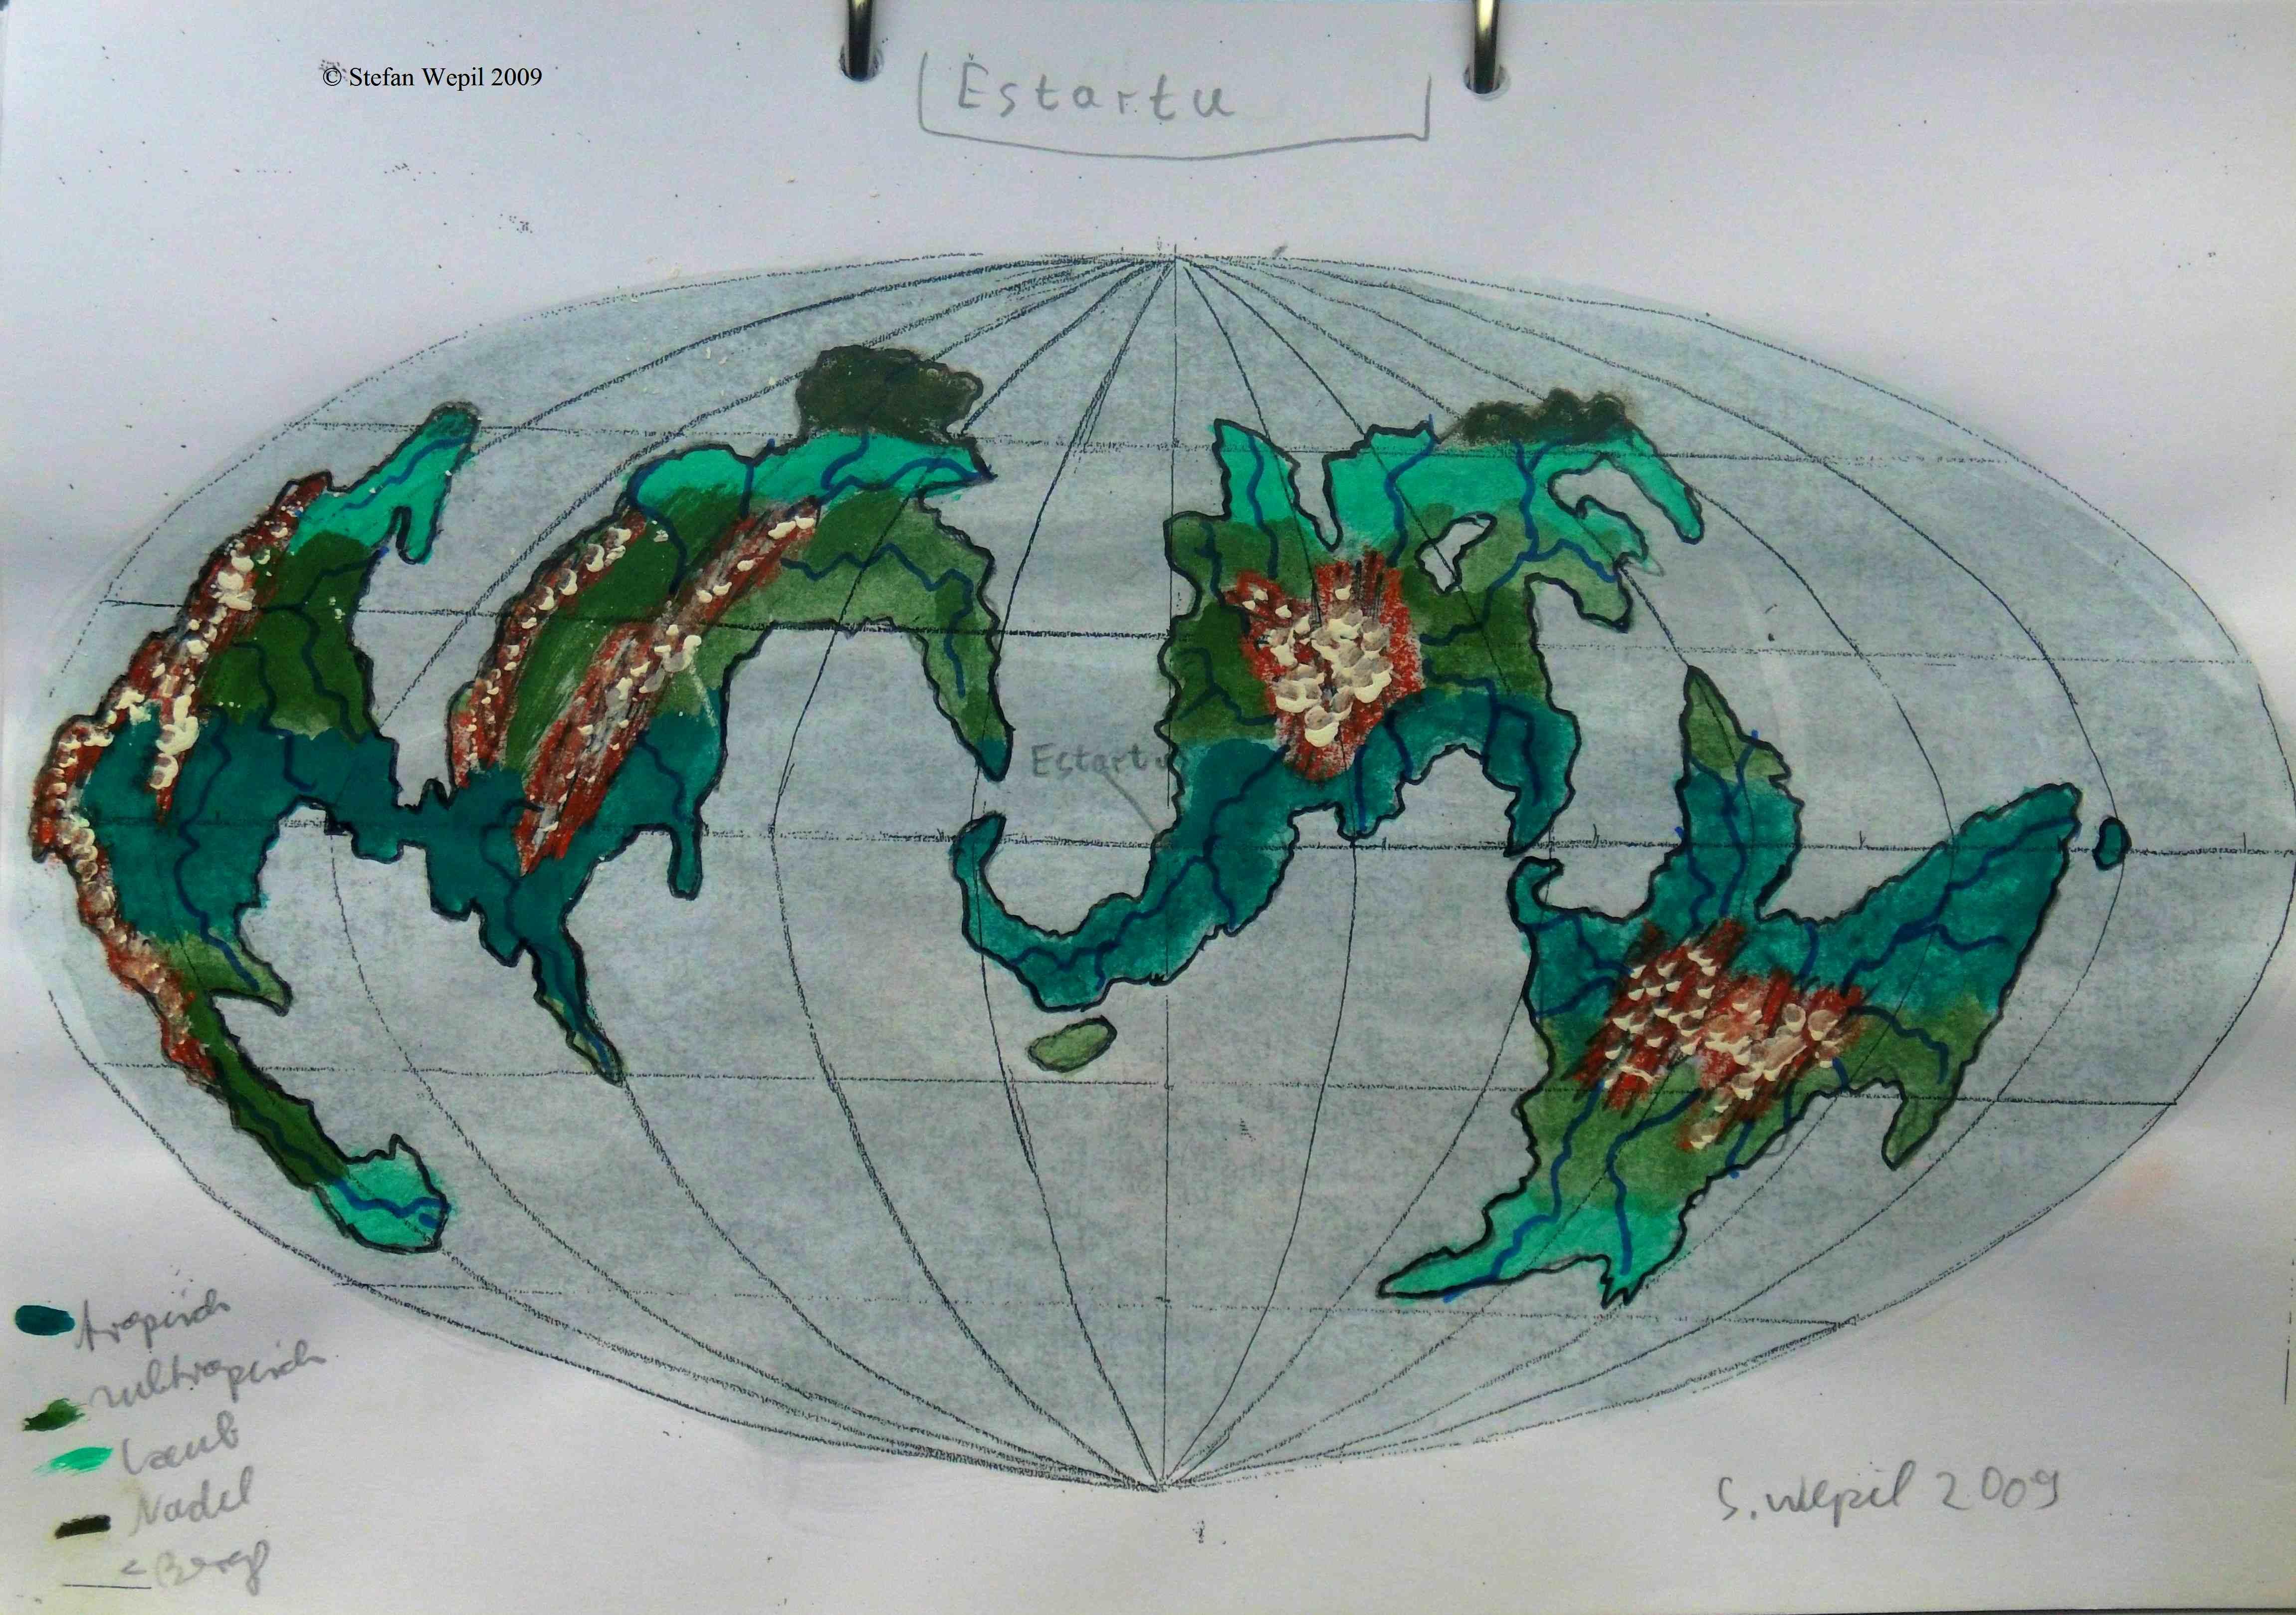 Karte der Welt Estartu in Cartwheel (C) Stefan Wepil